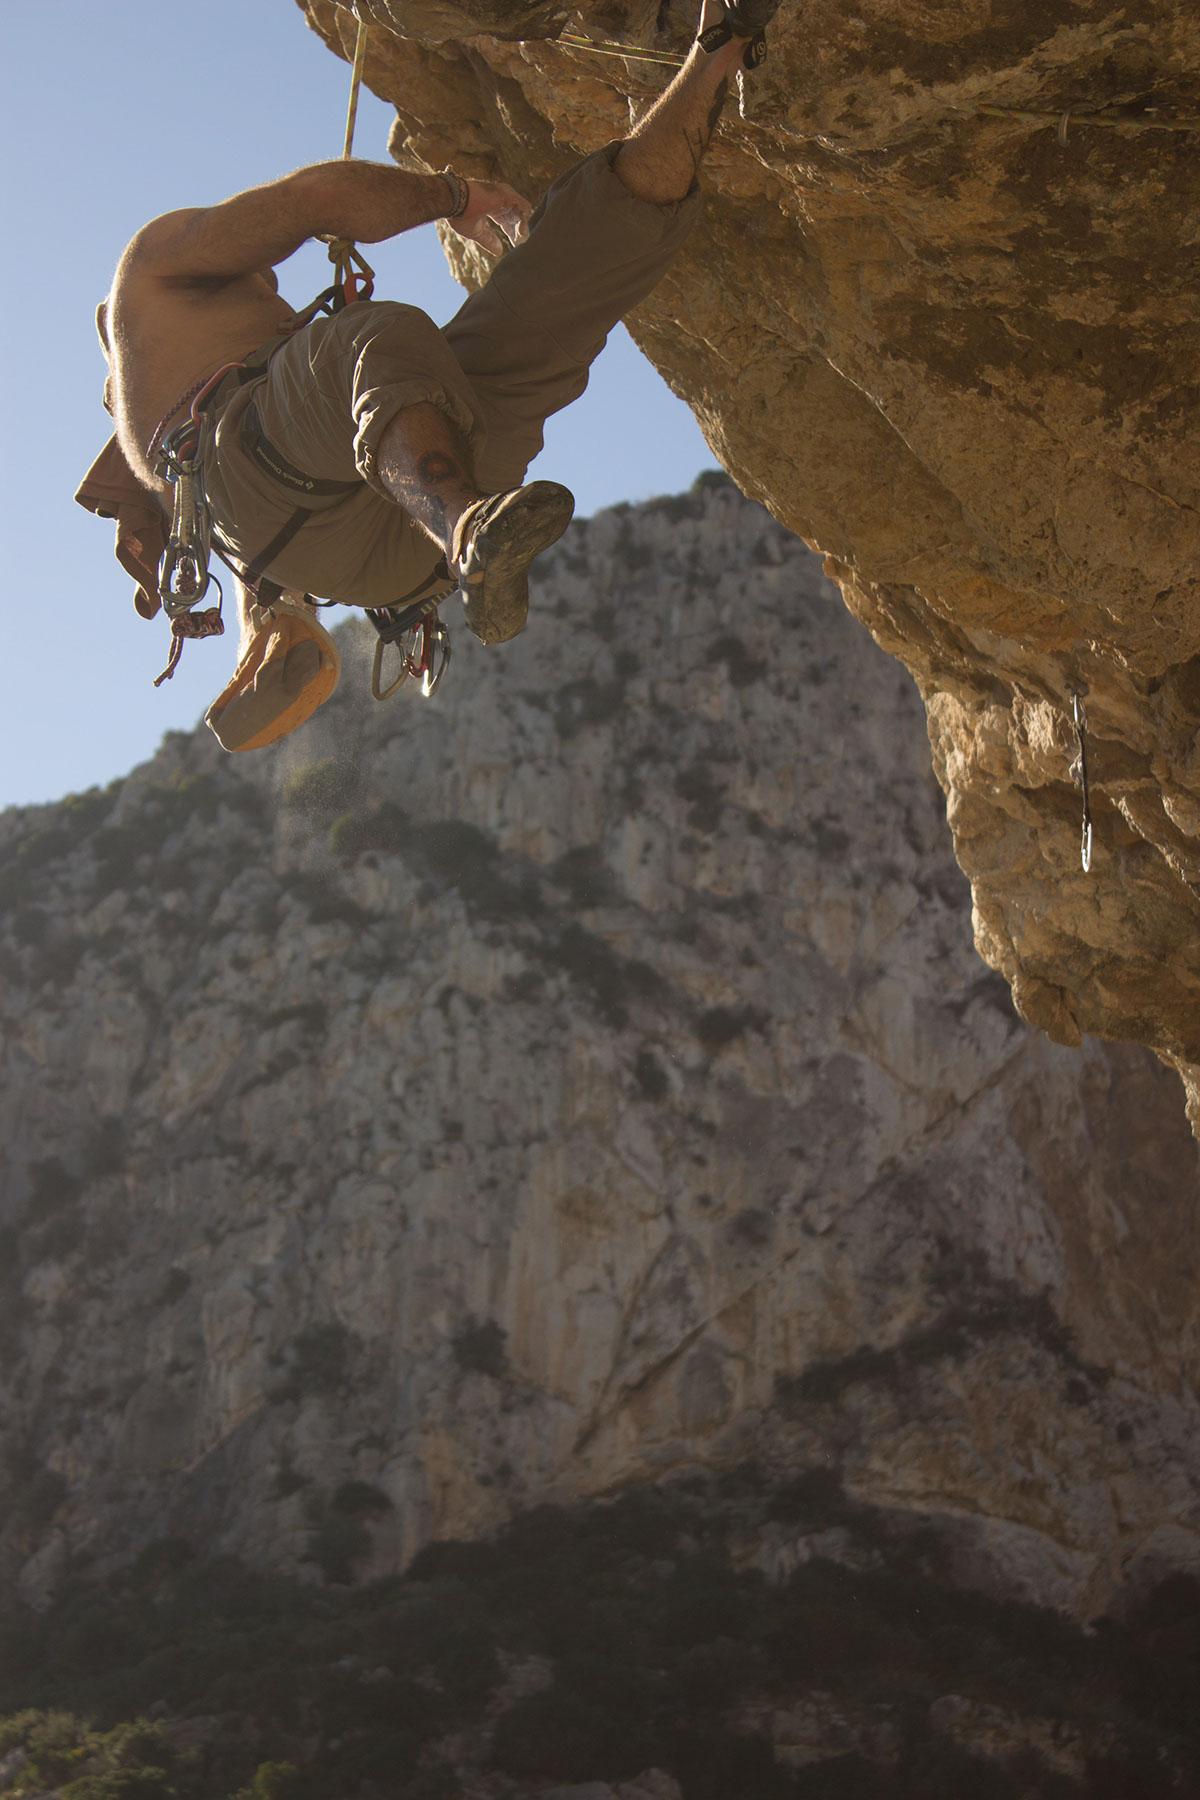 escalada climbing barcelona catania ilusion LIGEREZA niebla Destreza Melancolia esfuerzo victoria intrepido dulzura APOYO luchador